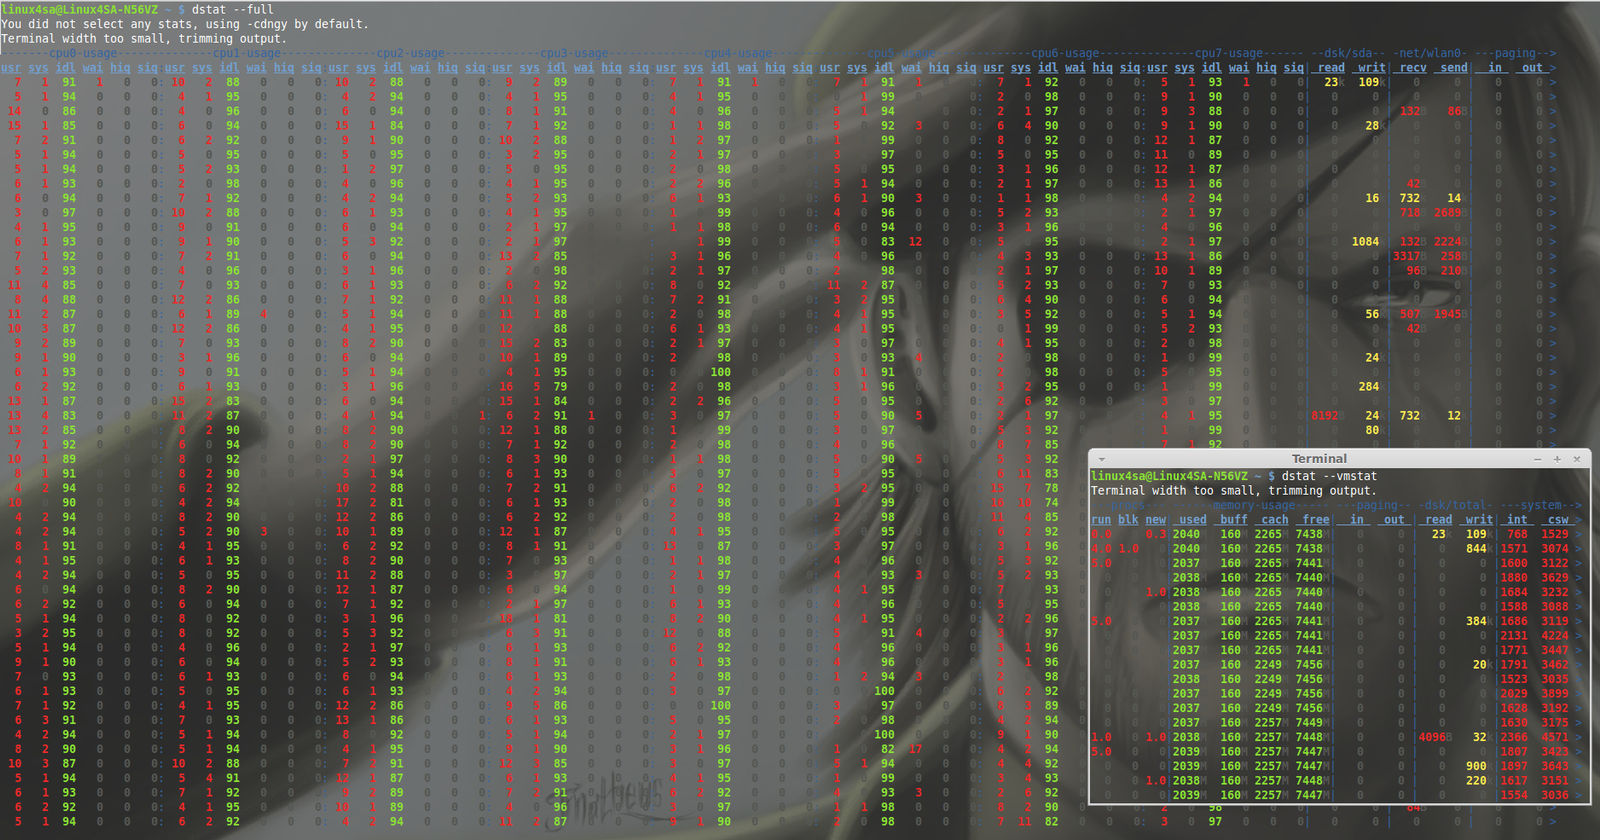 LinuxMint 17 dstat --full by Linux4SA